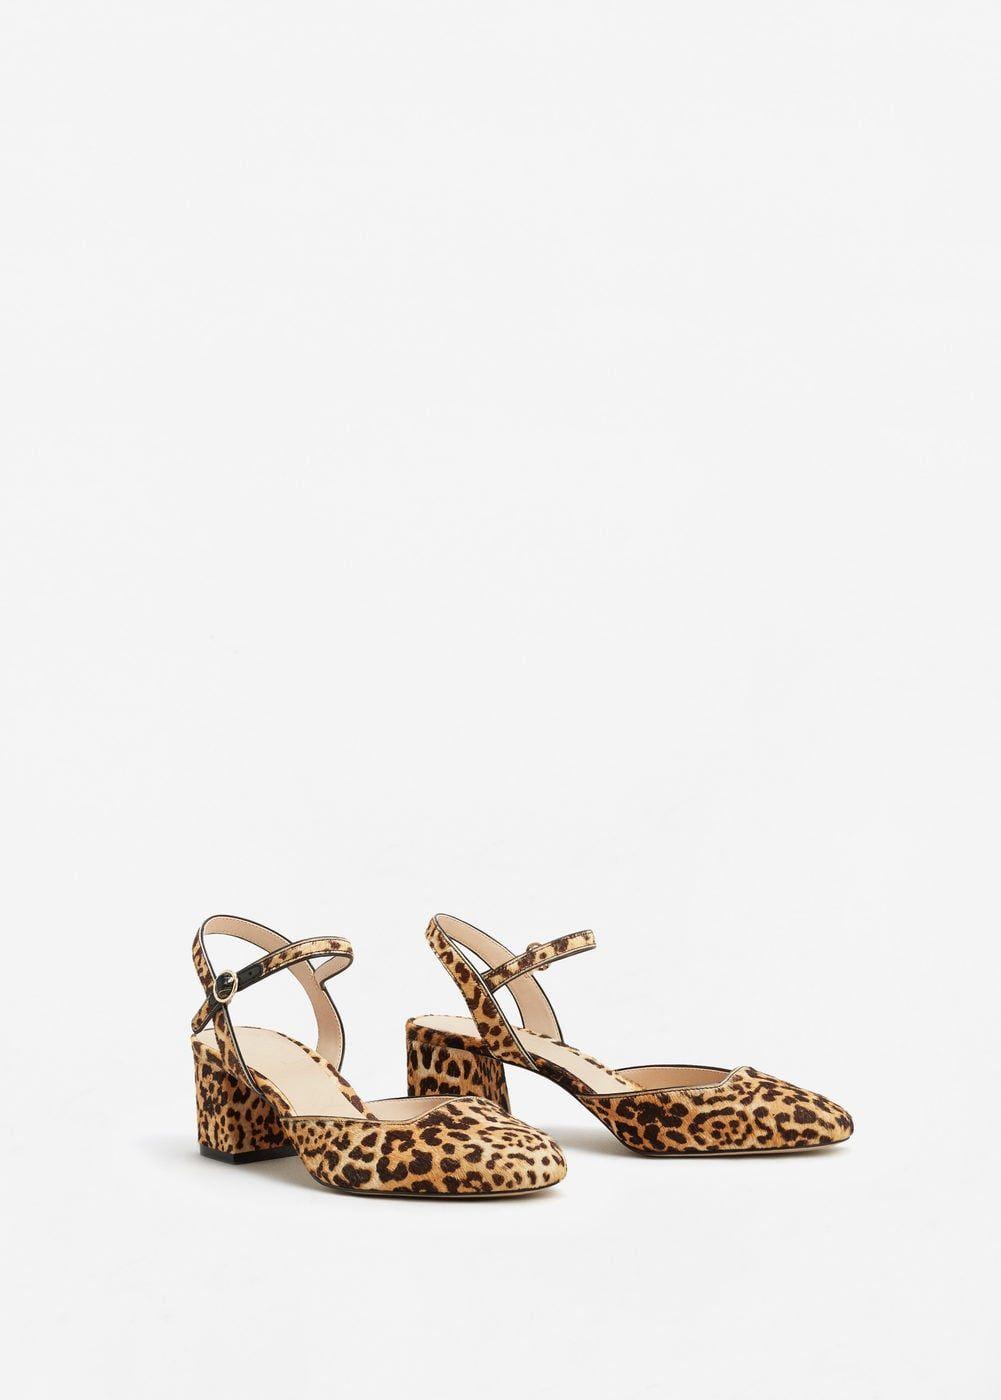 Buty Skorzane W Lamparcie Cetki Kobieta Mango Polska Zapatos Leopardo Zapatos De Estampado De Leopardo Zapatos Mujer